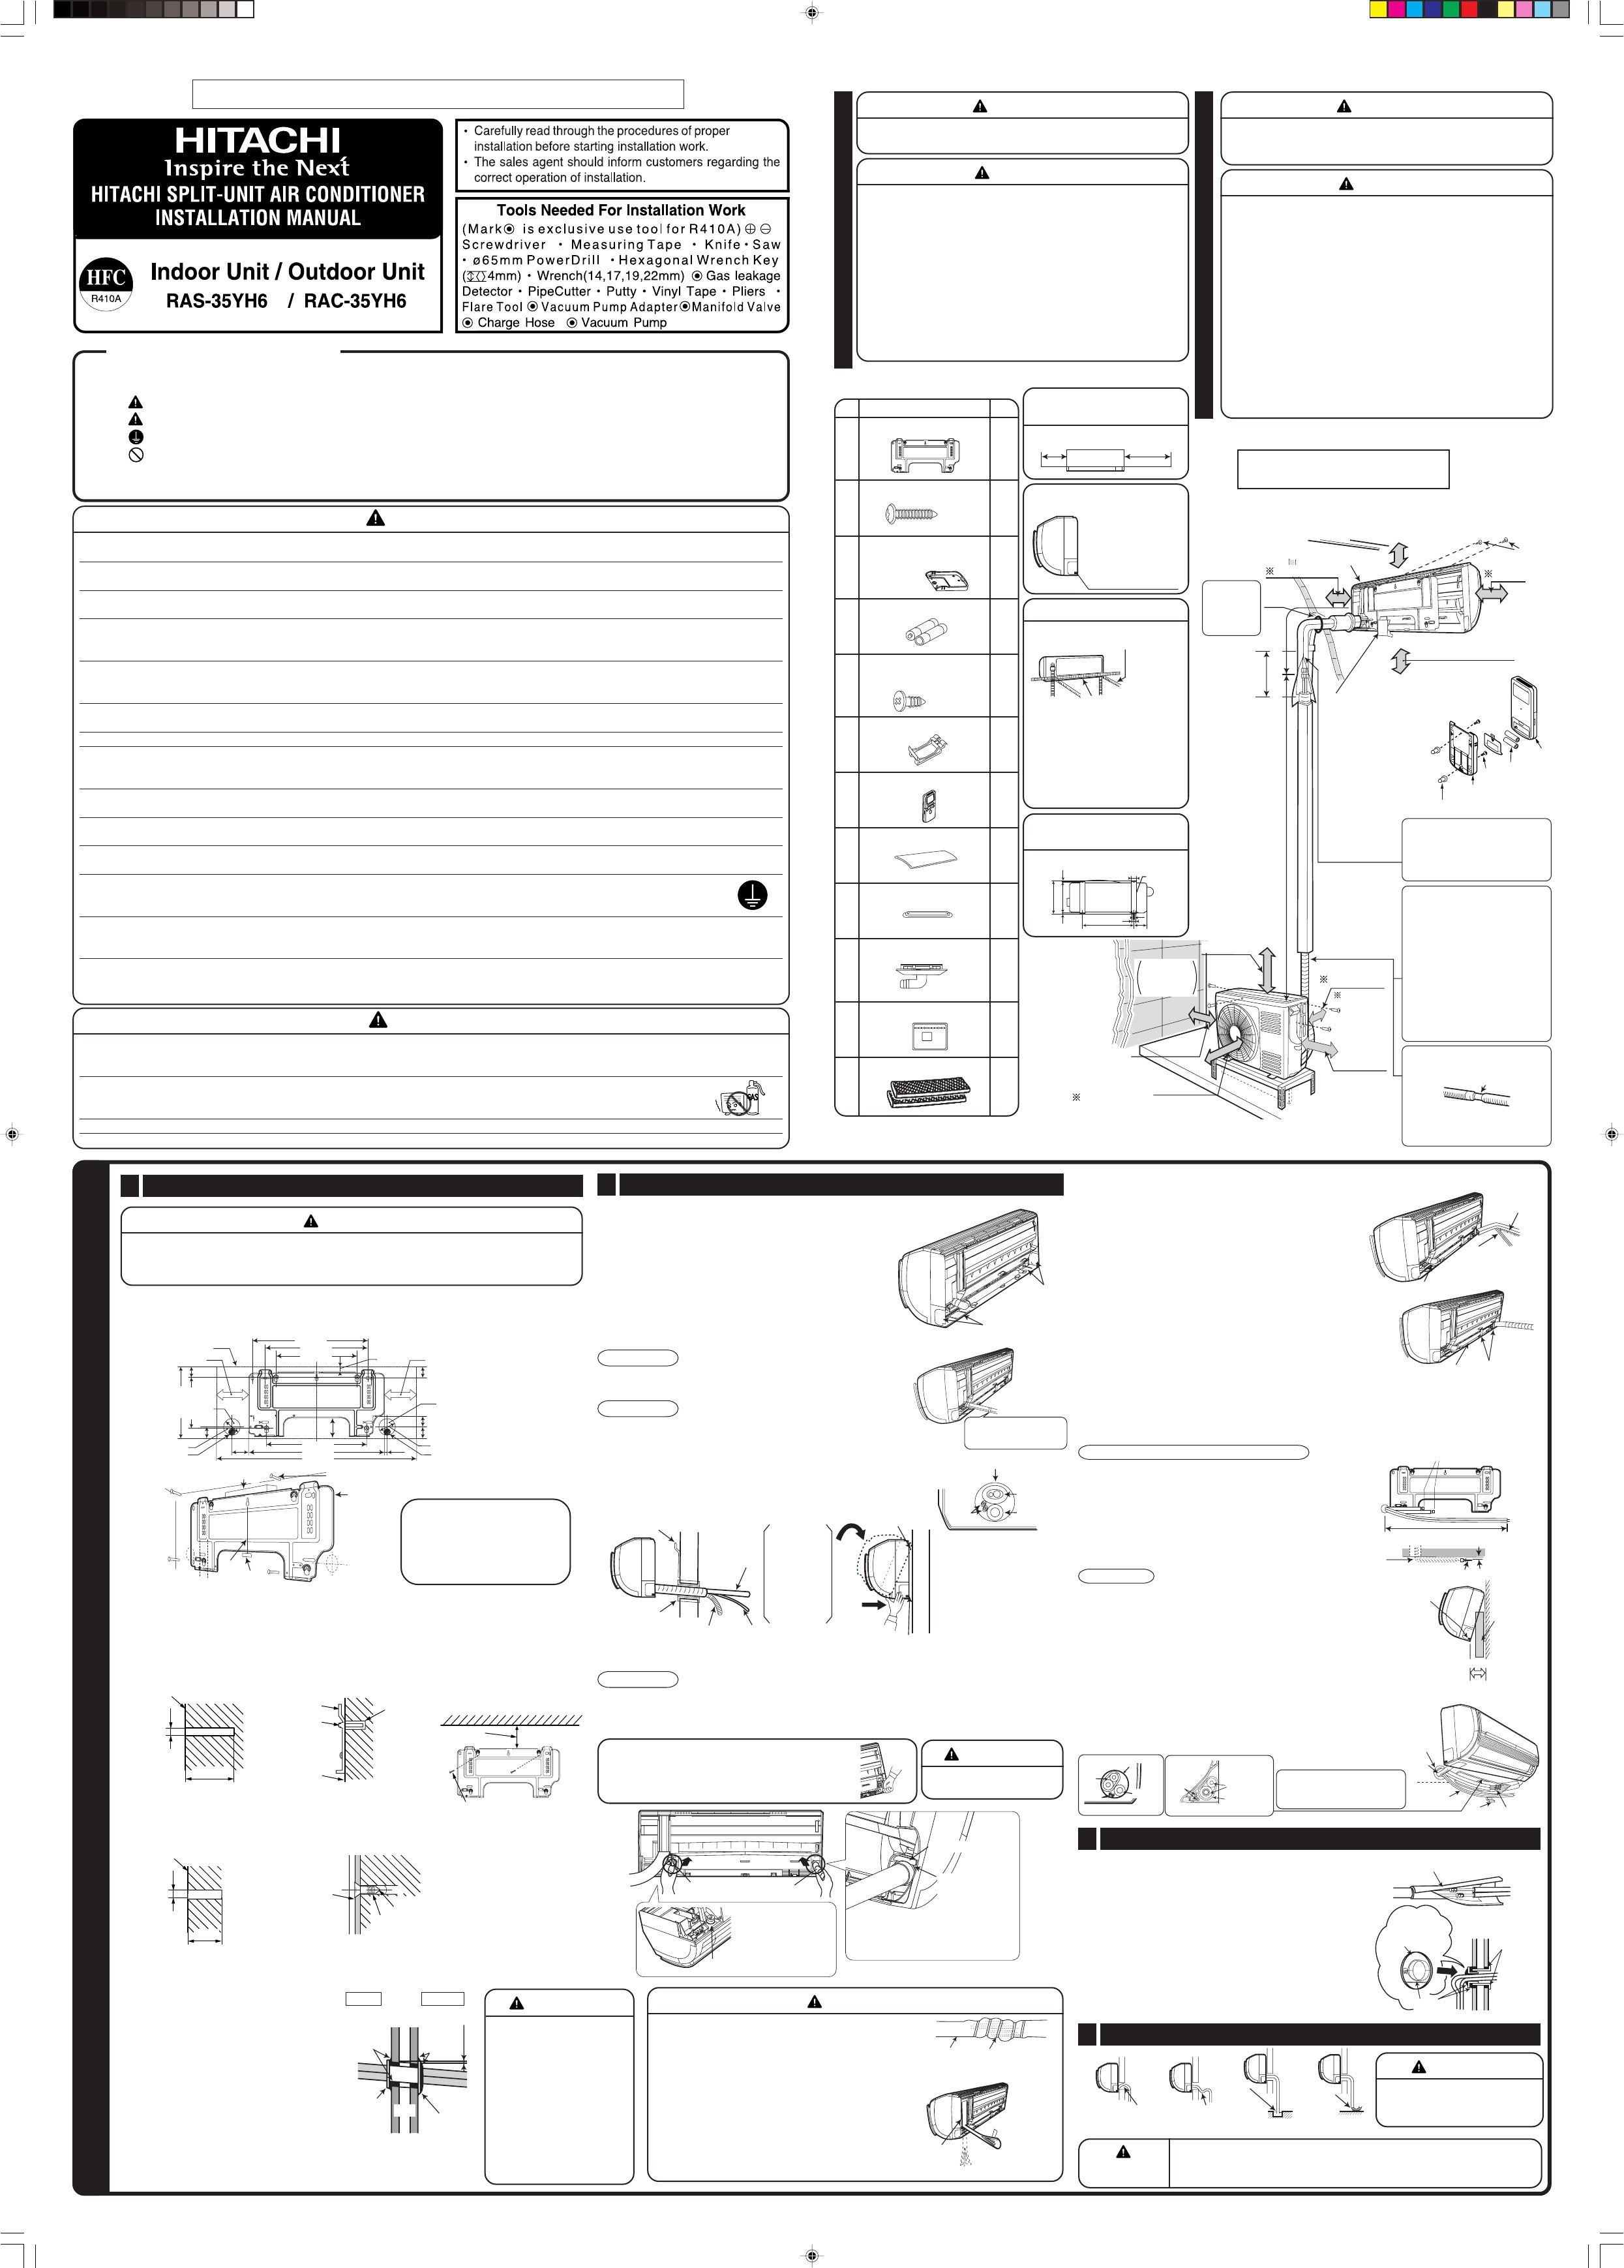 Wiring Diagram Ac Window Inspirationa Wiring Diagram Window Ac Unit Valid Air Conditioner Wiring Diagram